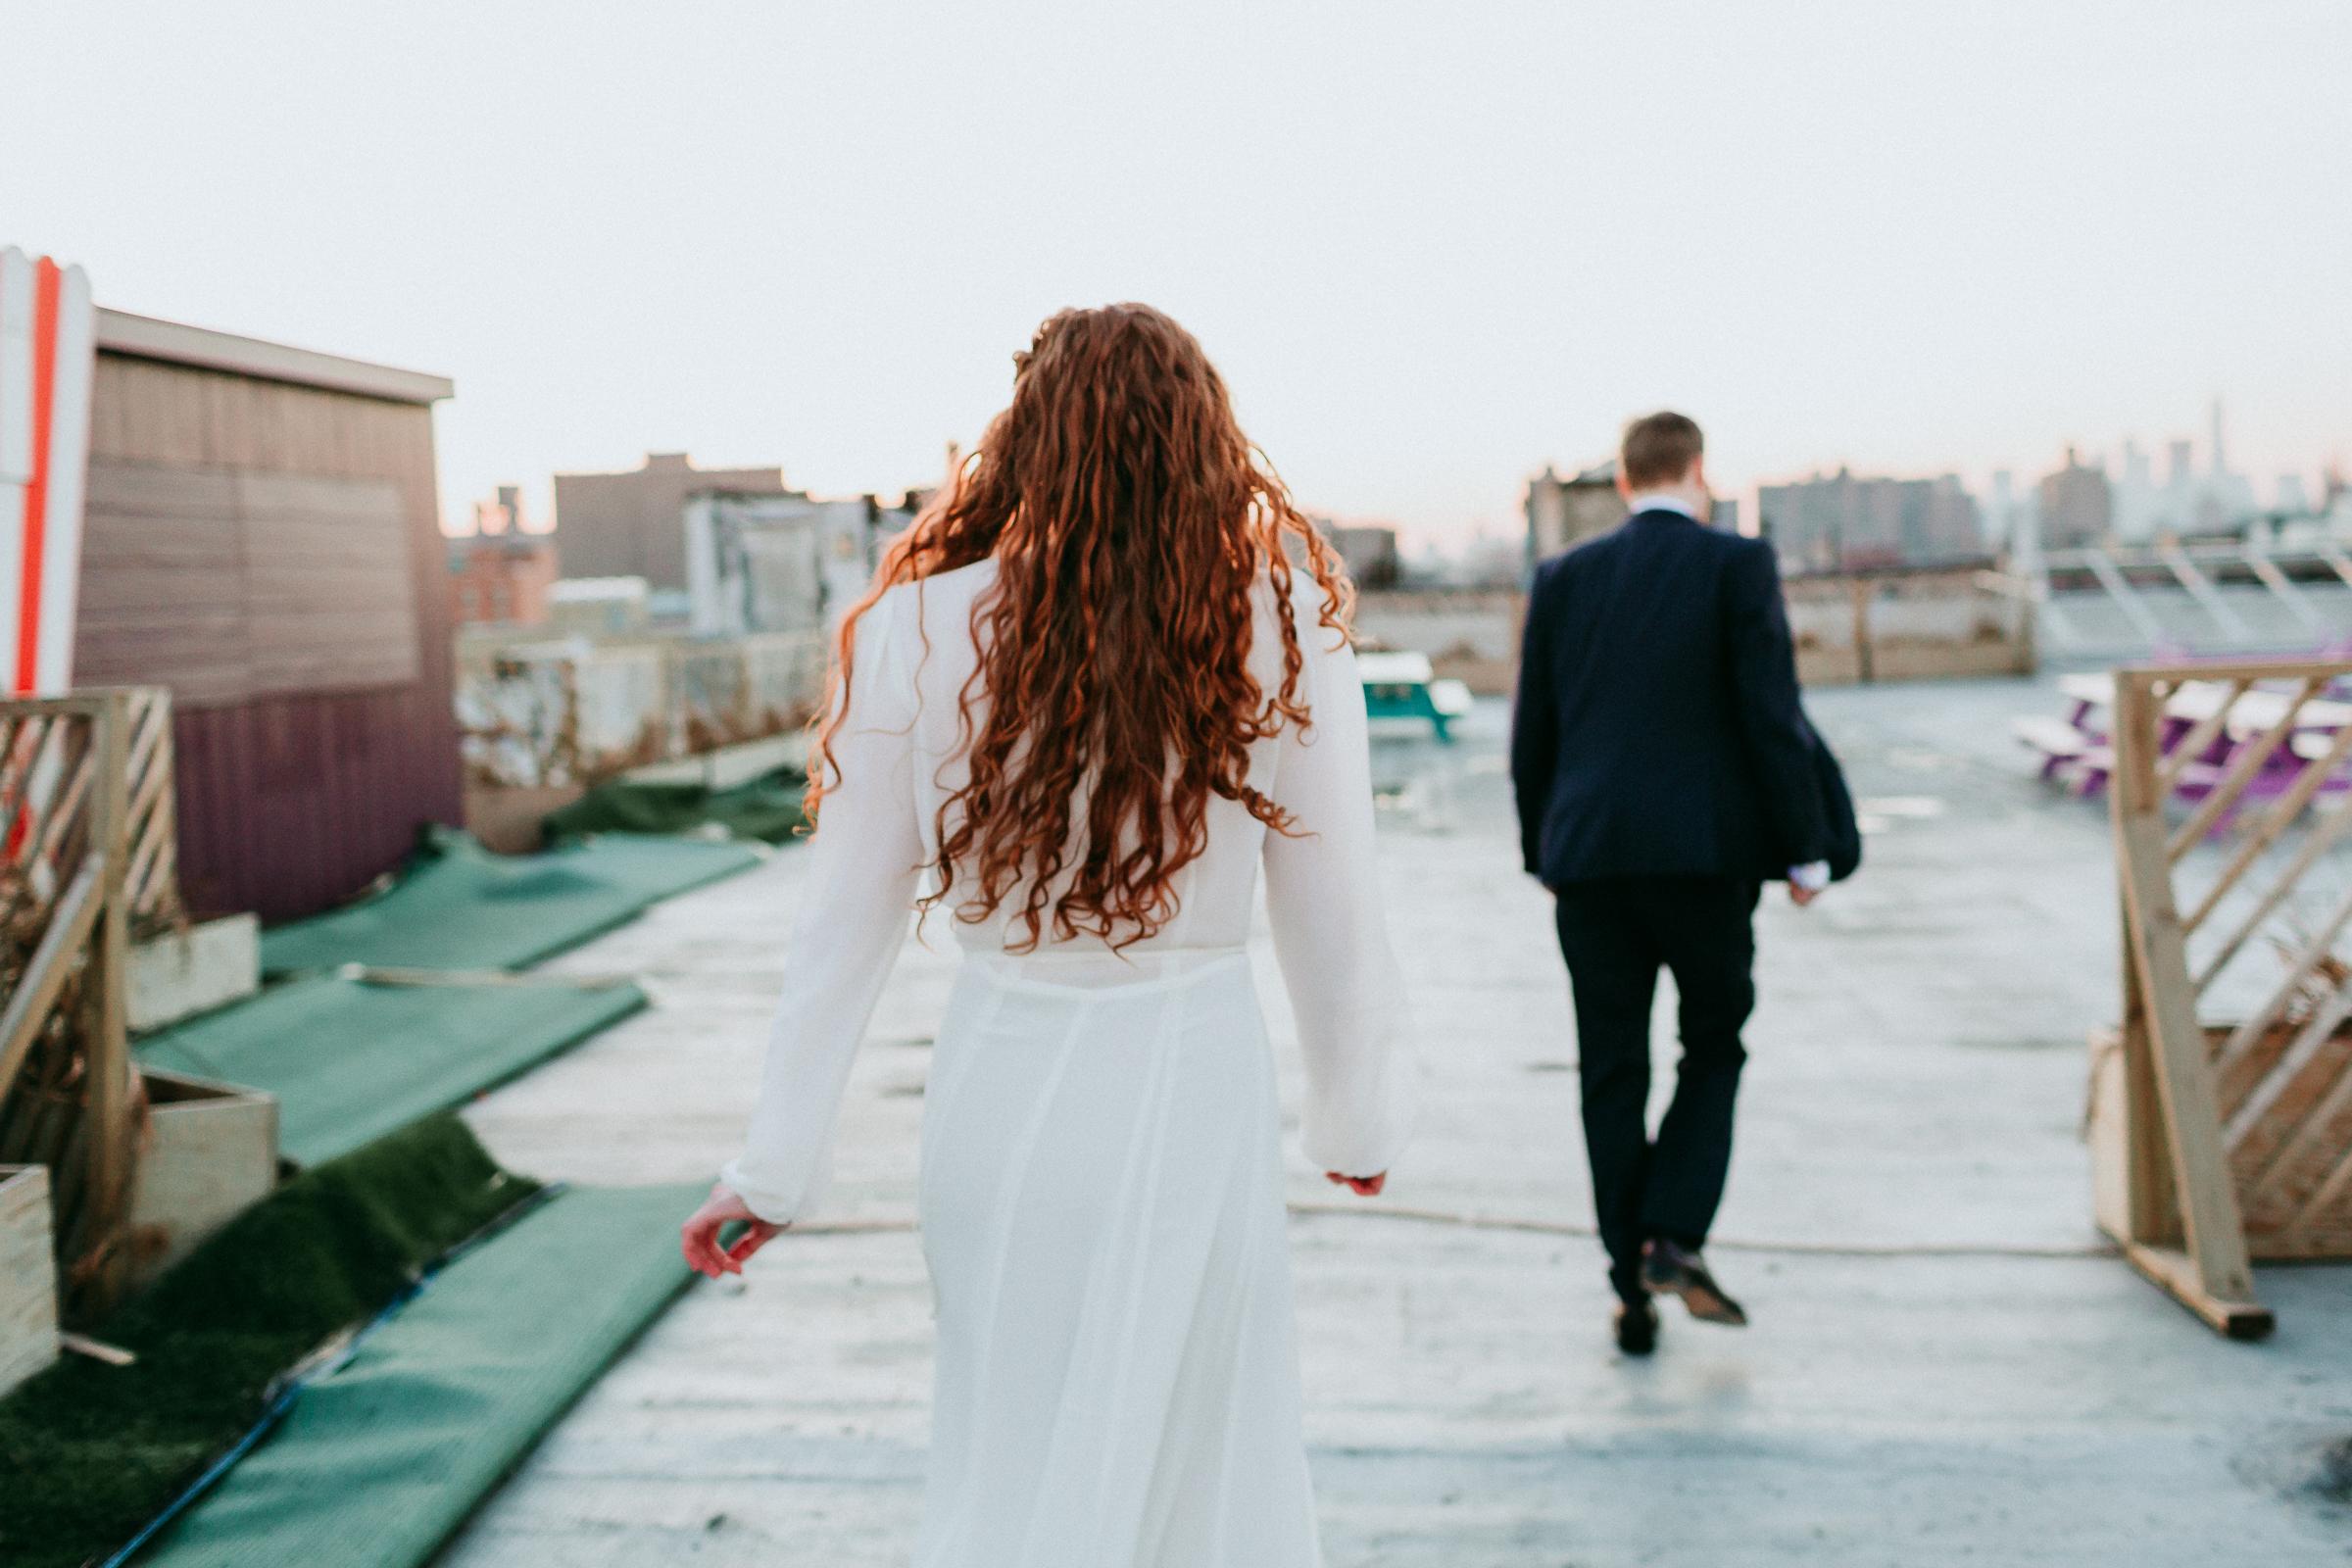 Freemans-Restaurant-Soho-Brooklyn-Bridge-Park-Dumbo-Documentary-Wedding-Photographer-32.jpg